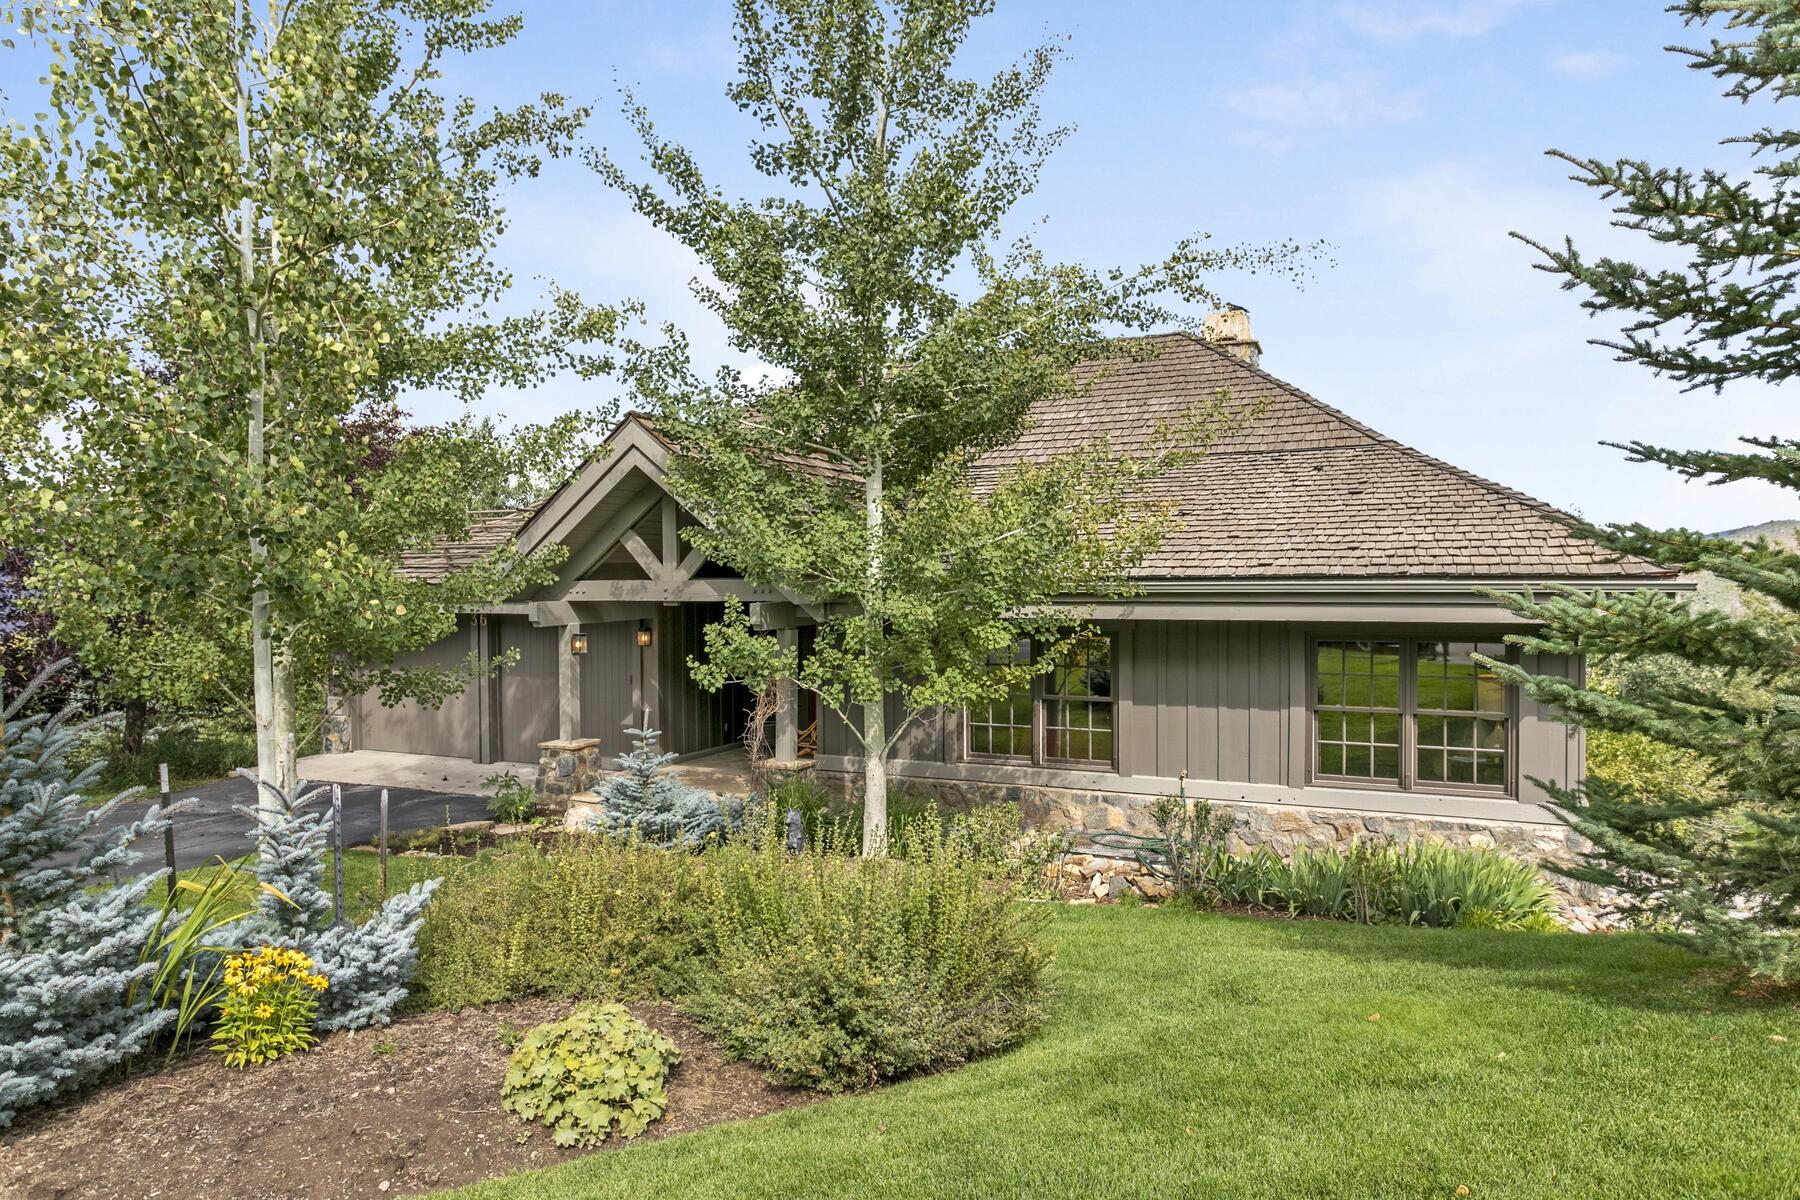 Single Family Homes のために 売買 アット Bentgrass Enclave Residence 36 Fairway Lane, Edwards, コロラド 81632 アメリカ